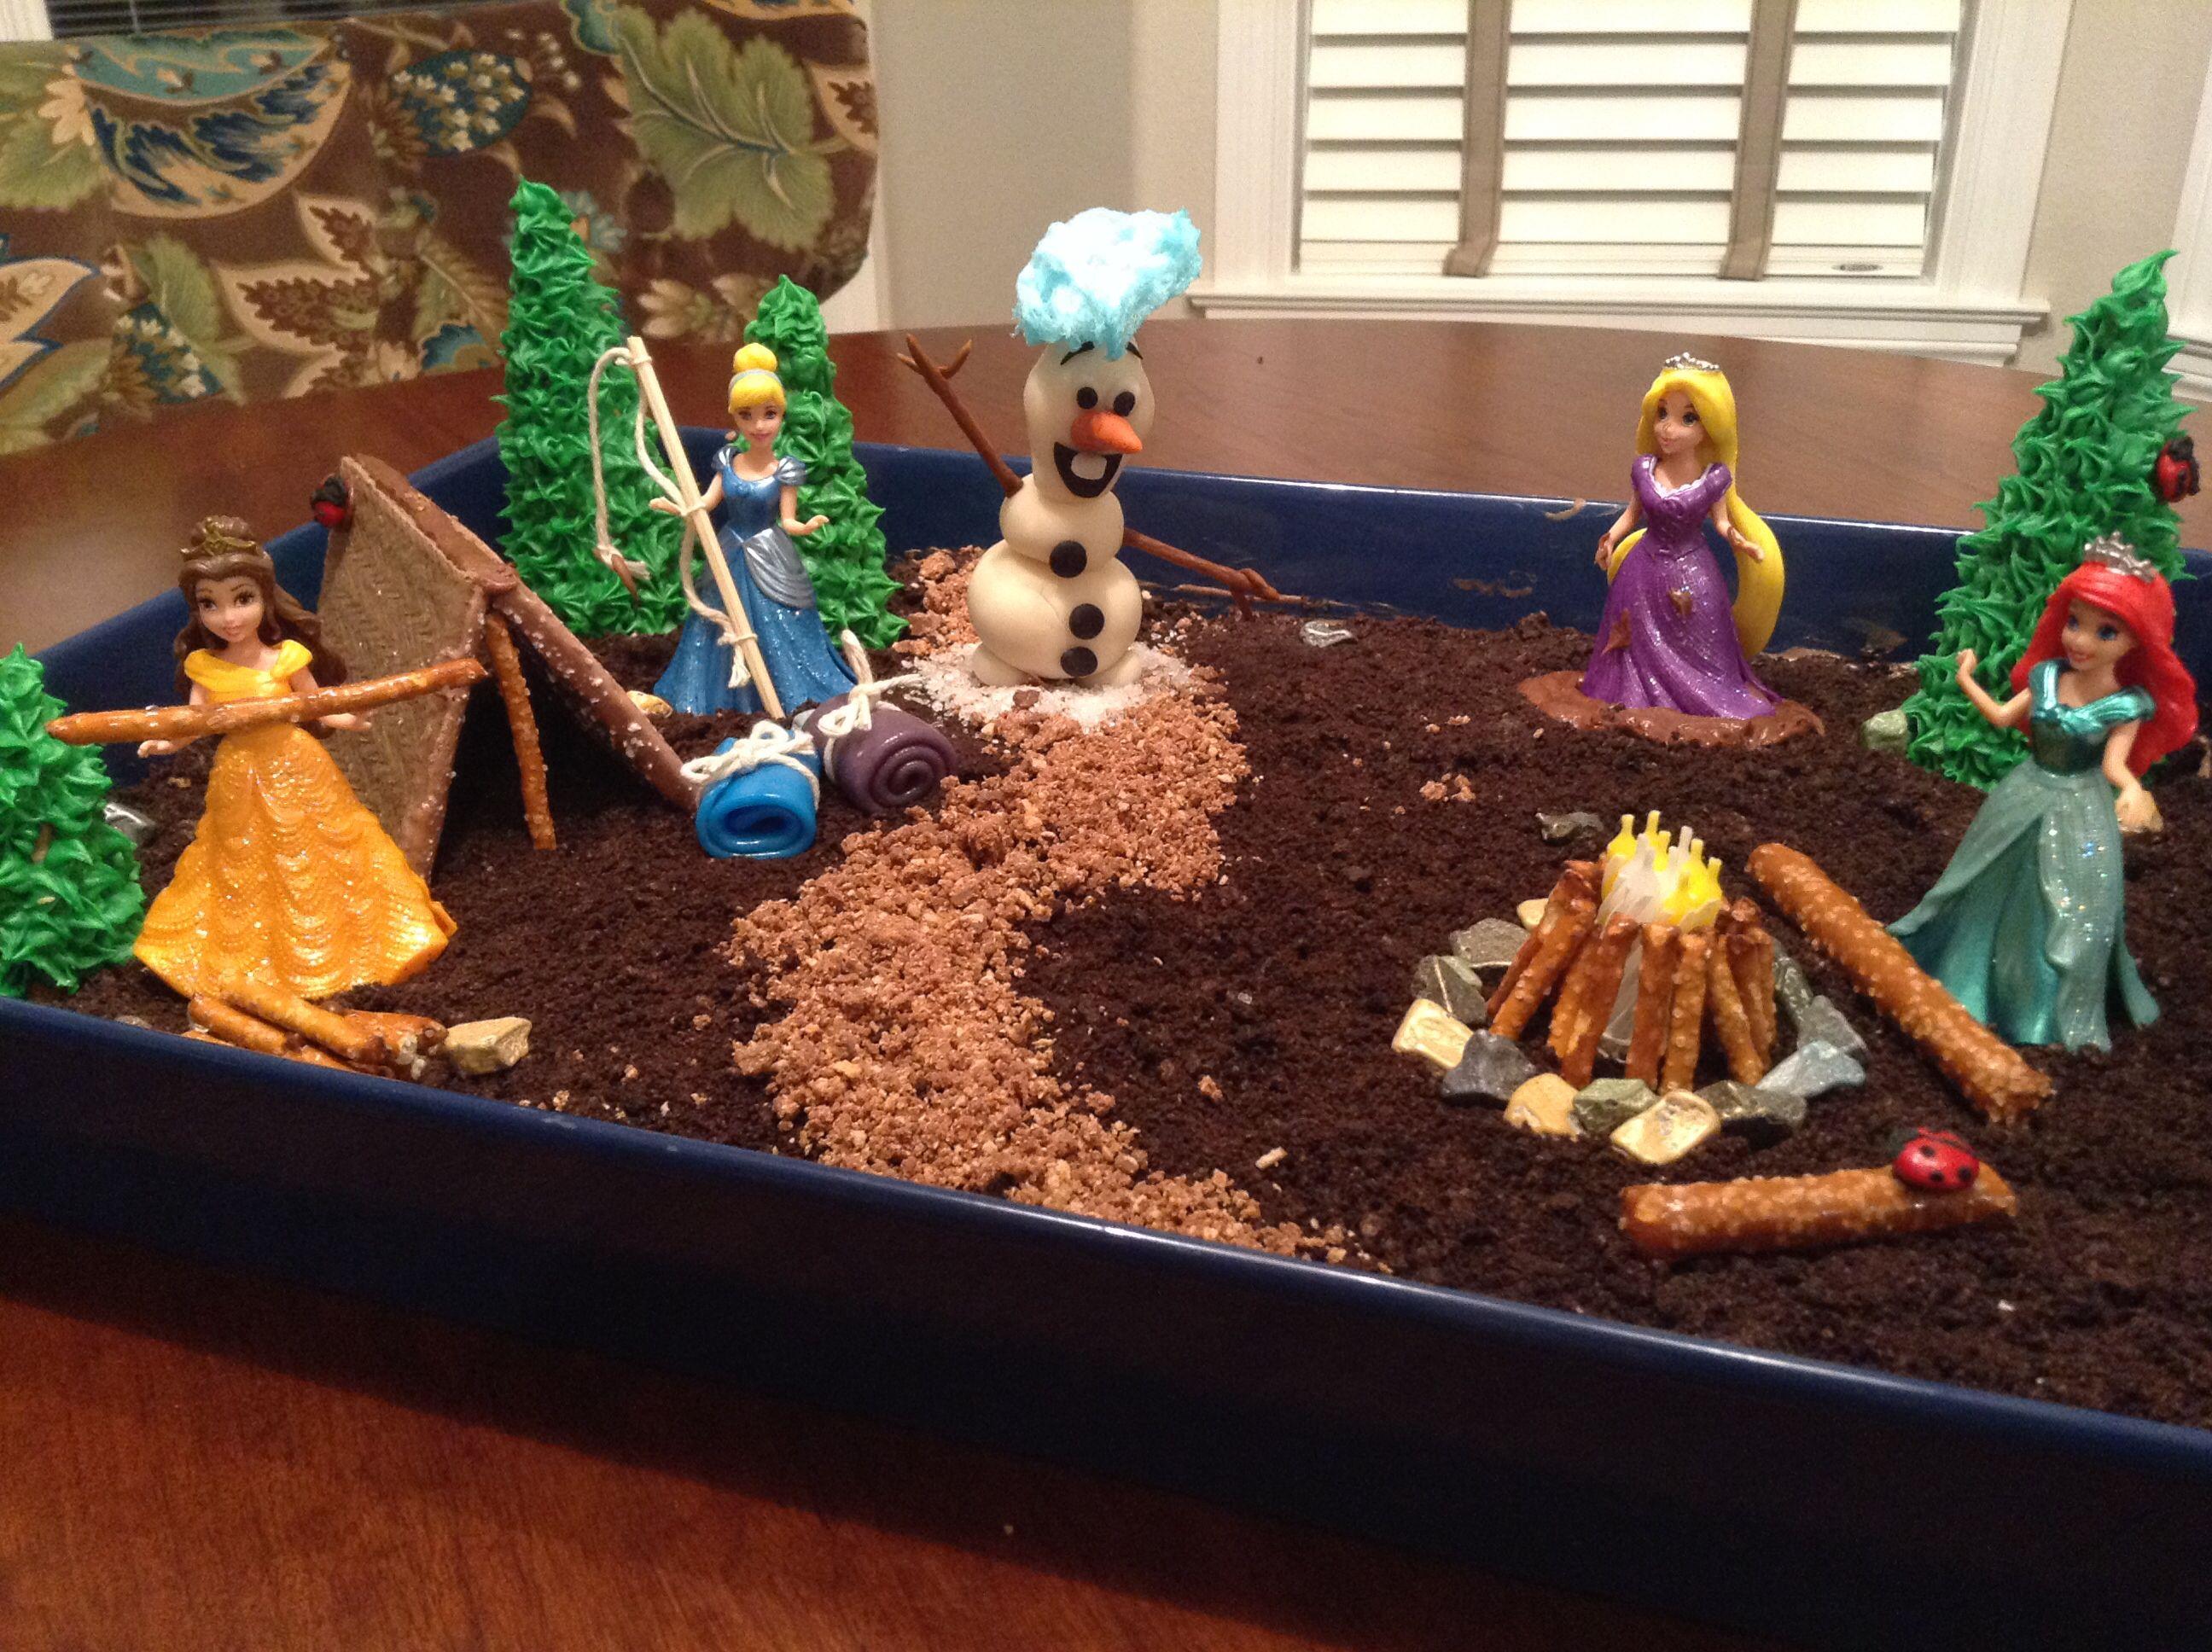 Princess camping dirt cake! Cinderella with a fishing pole